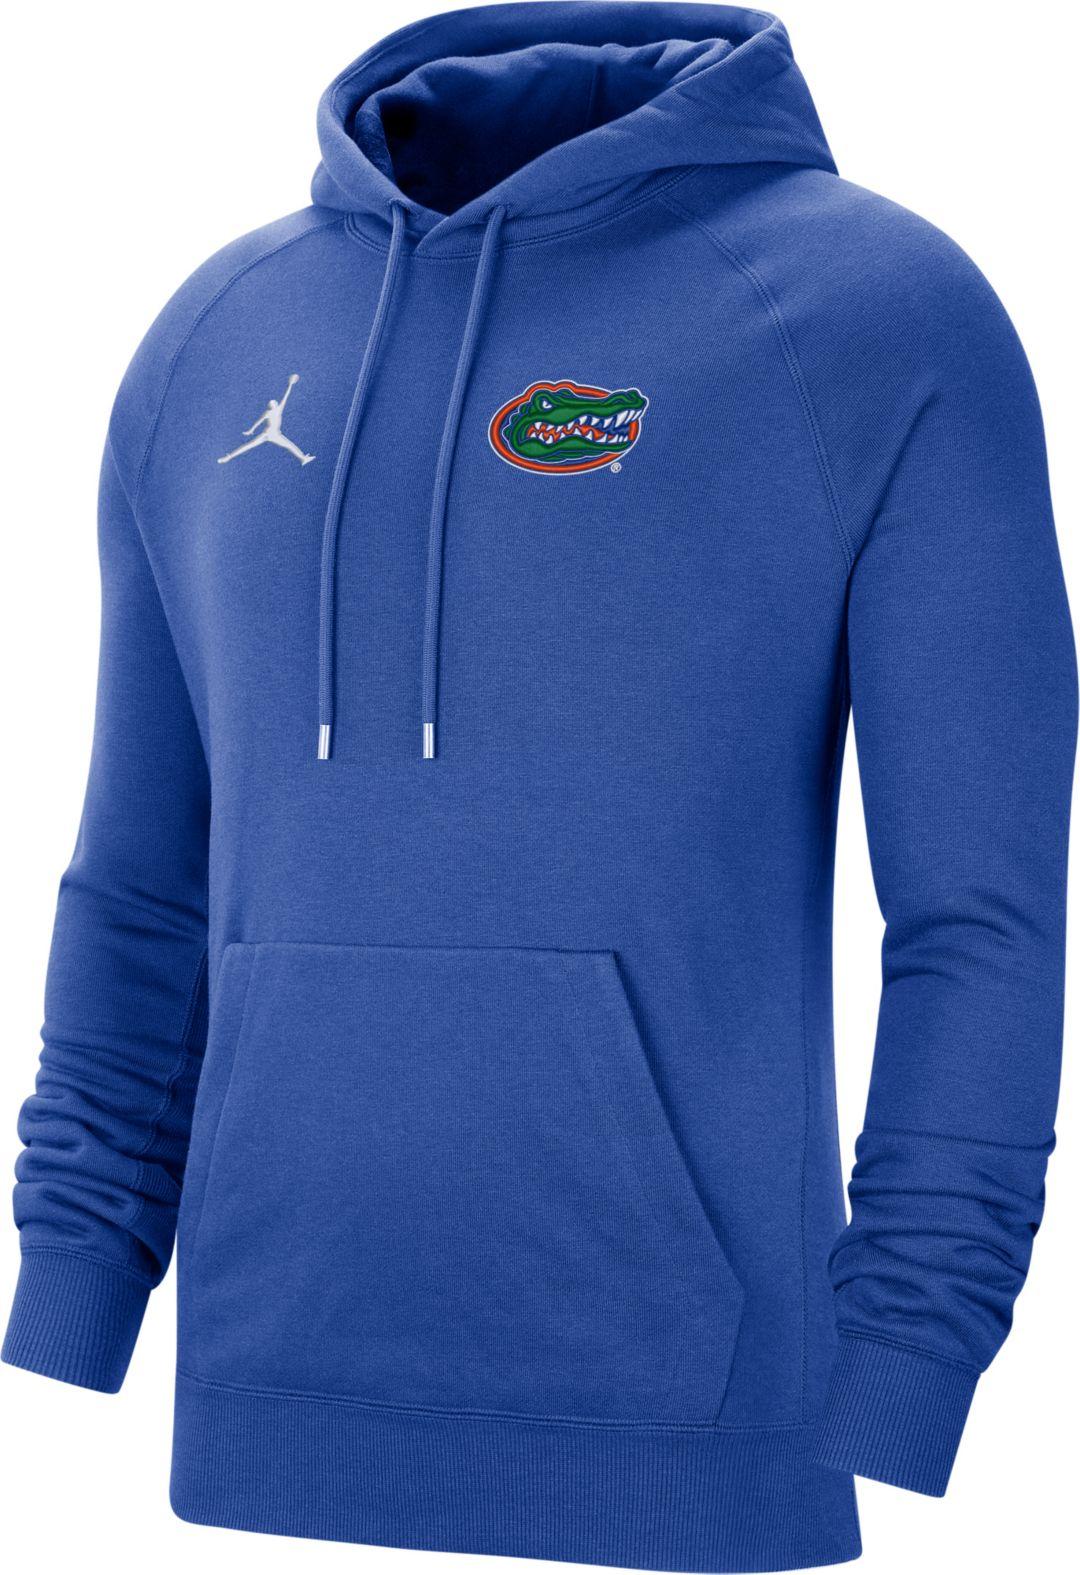 pretty nice e059c 1d217 Jordan Men's Florida Gators Blue Therma Football Sideline Pullover Hoodie